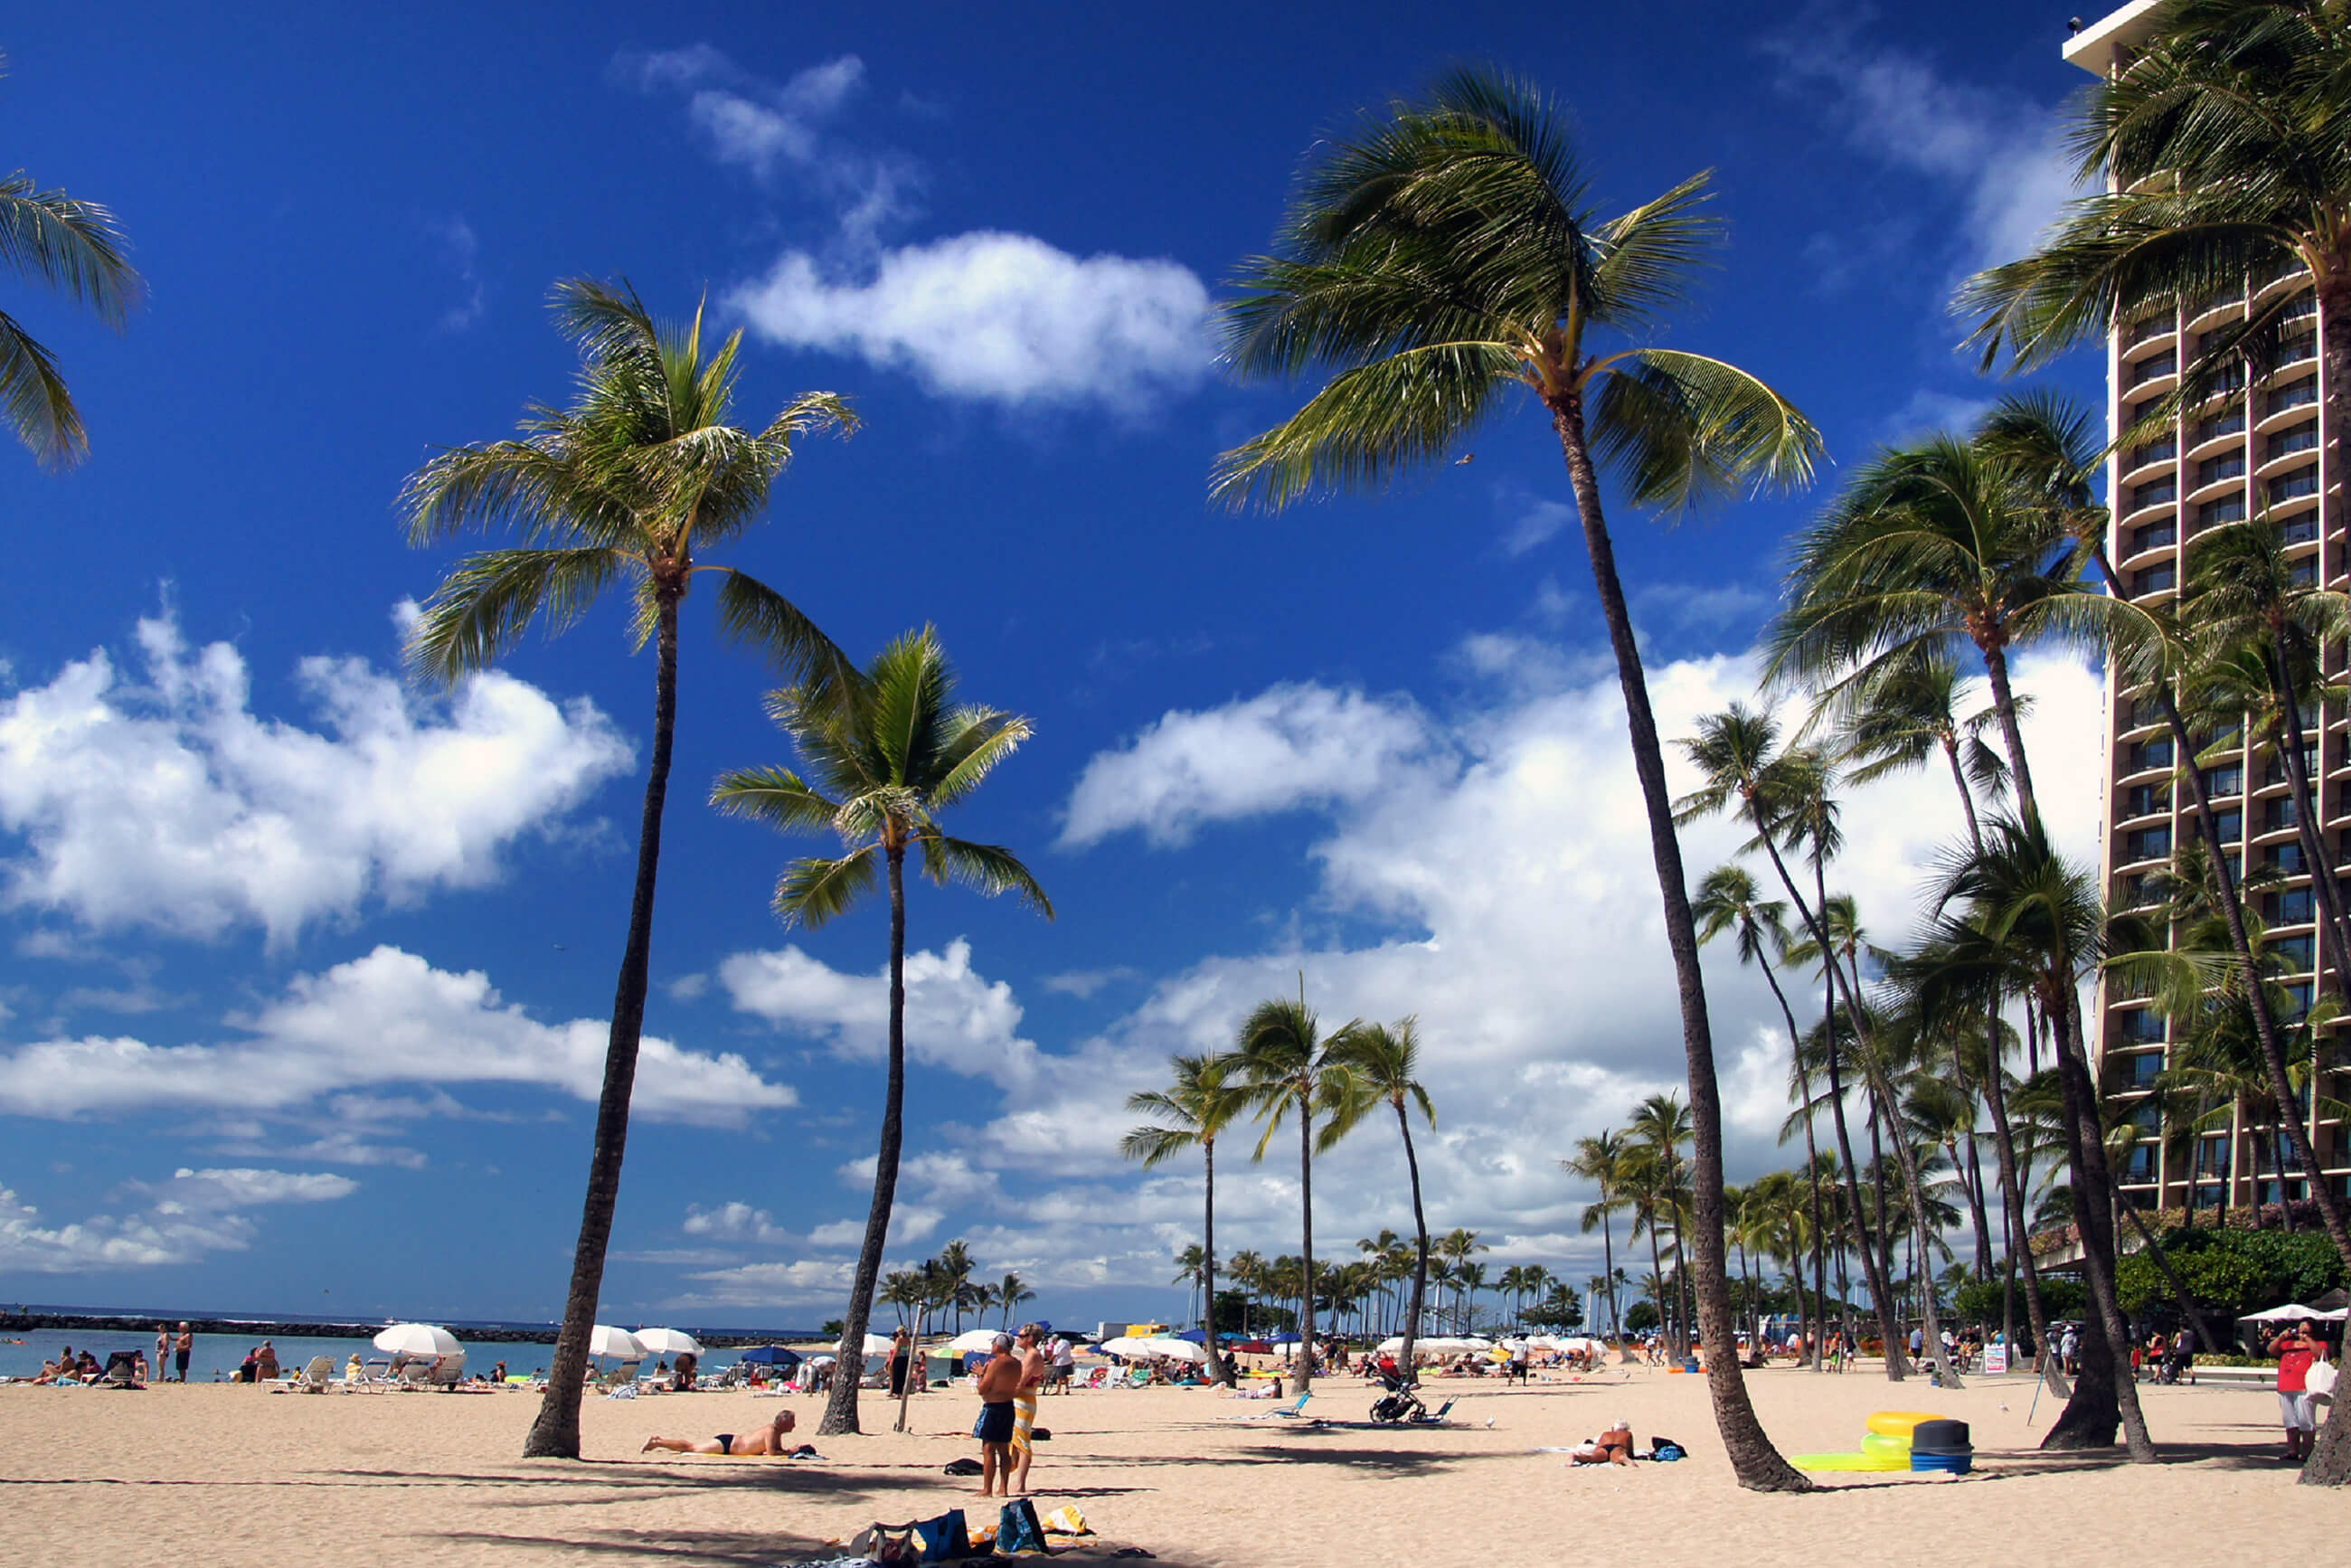 https://bubo.sk/uploads/galleries/16052/pxb_havaj_hawaii-3700185.jpg